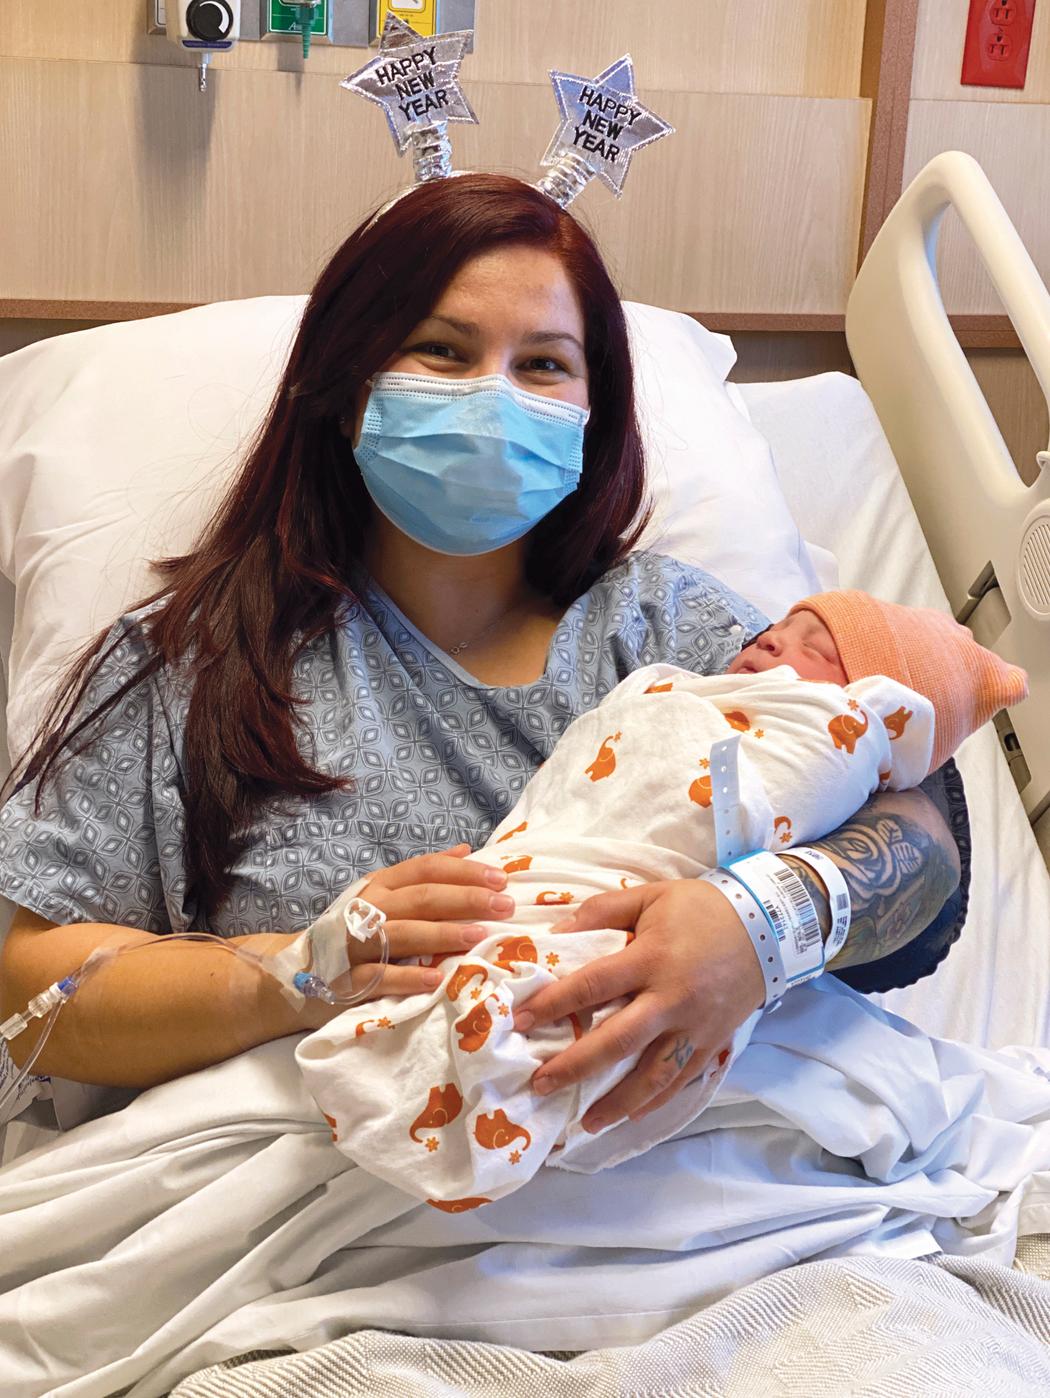 First baby born at St. John's Regional Medical Center in Oxnard